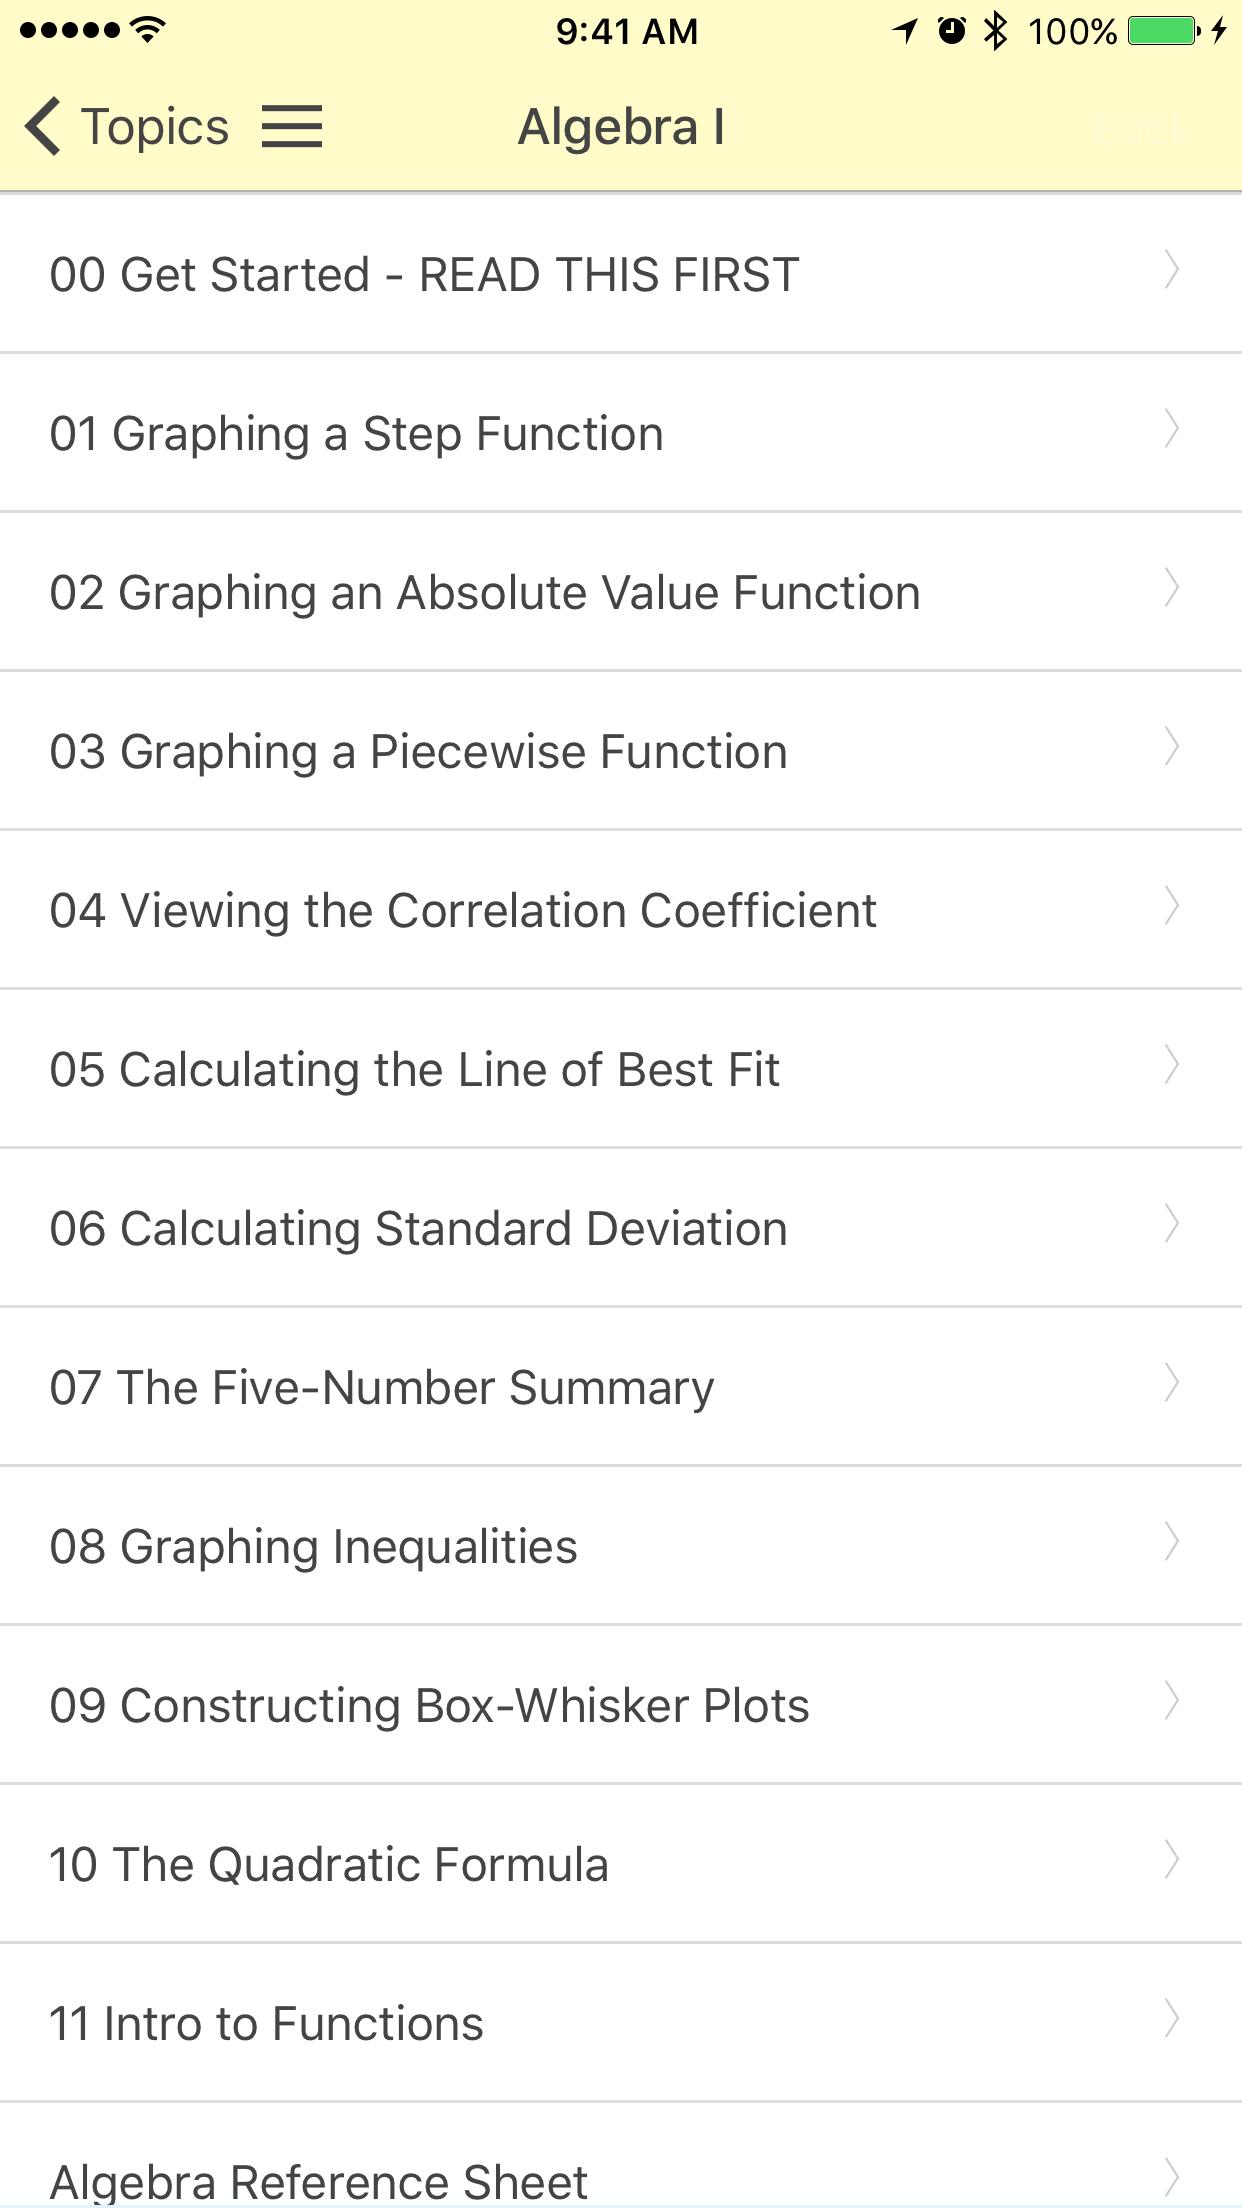 /srv/www/vhosts/user3101/html/entrepreneurship-campus.org/wp-content/uploads/2019/05/MathPP_Algebra_Topics_List.png